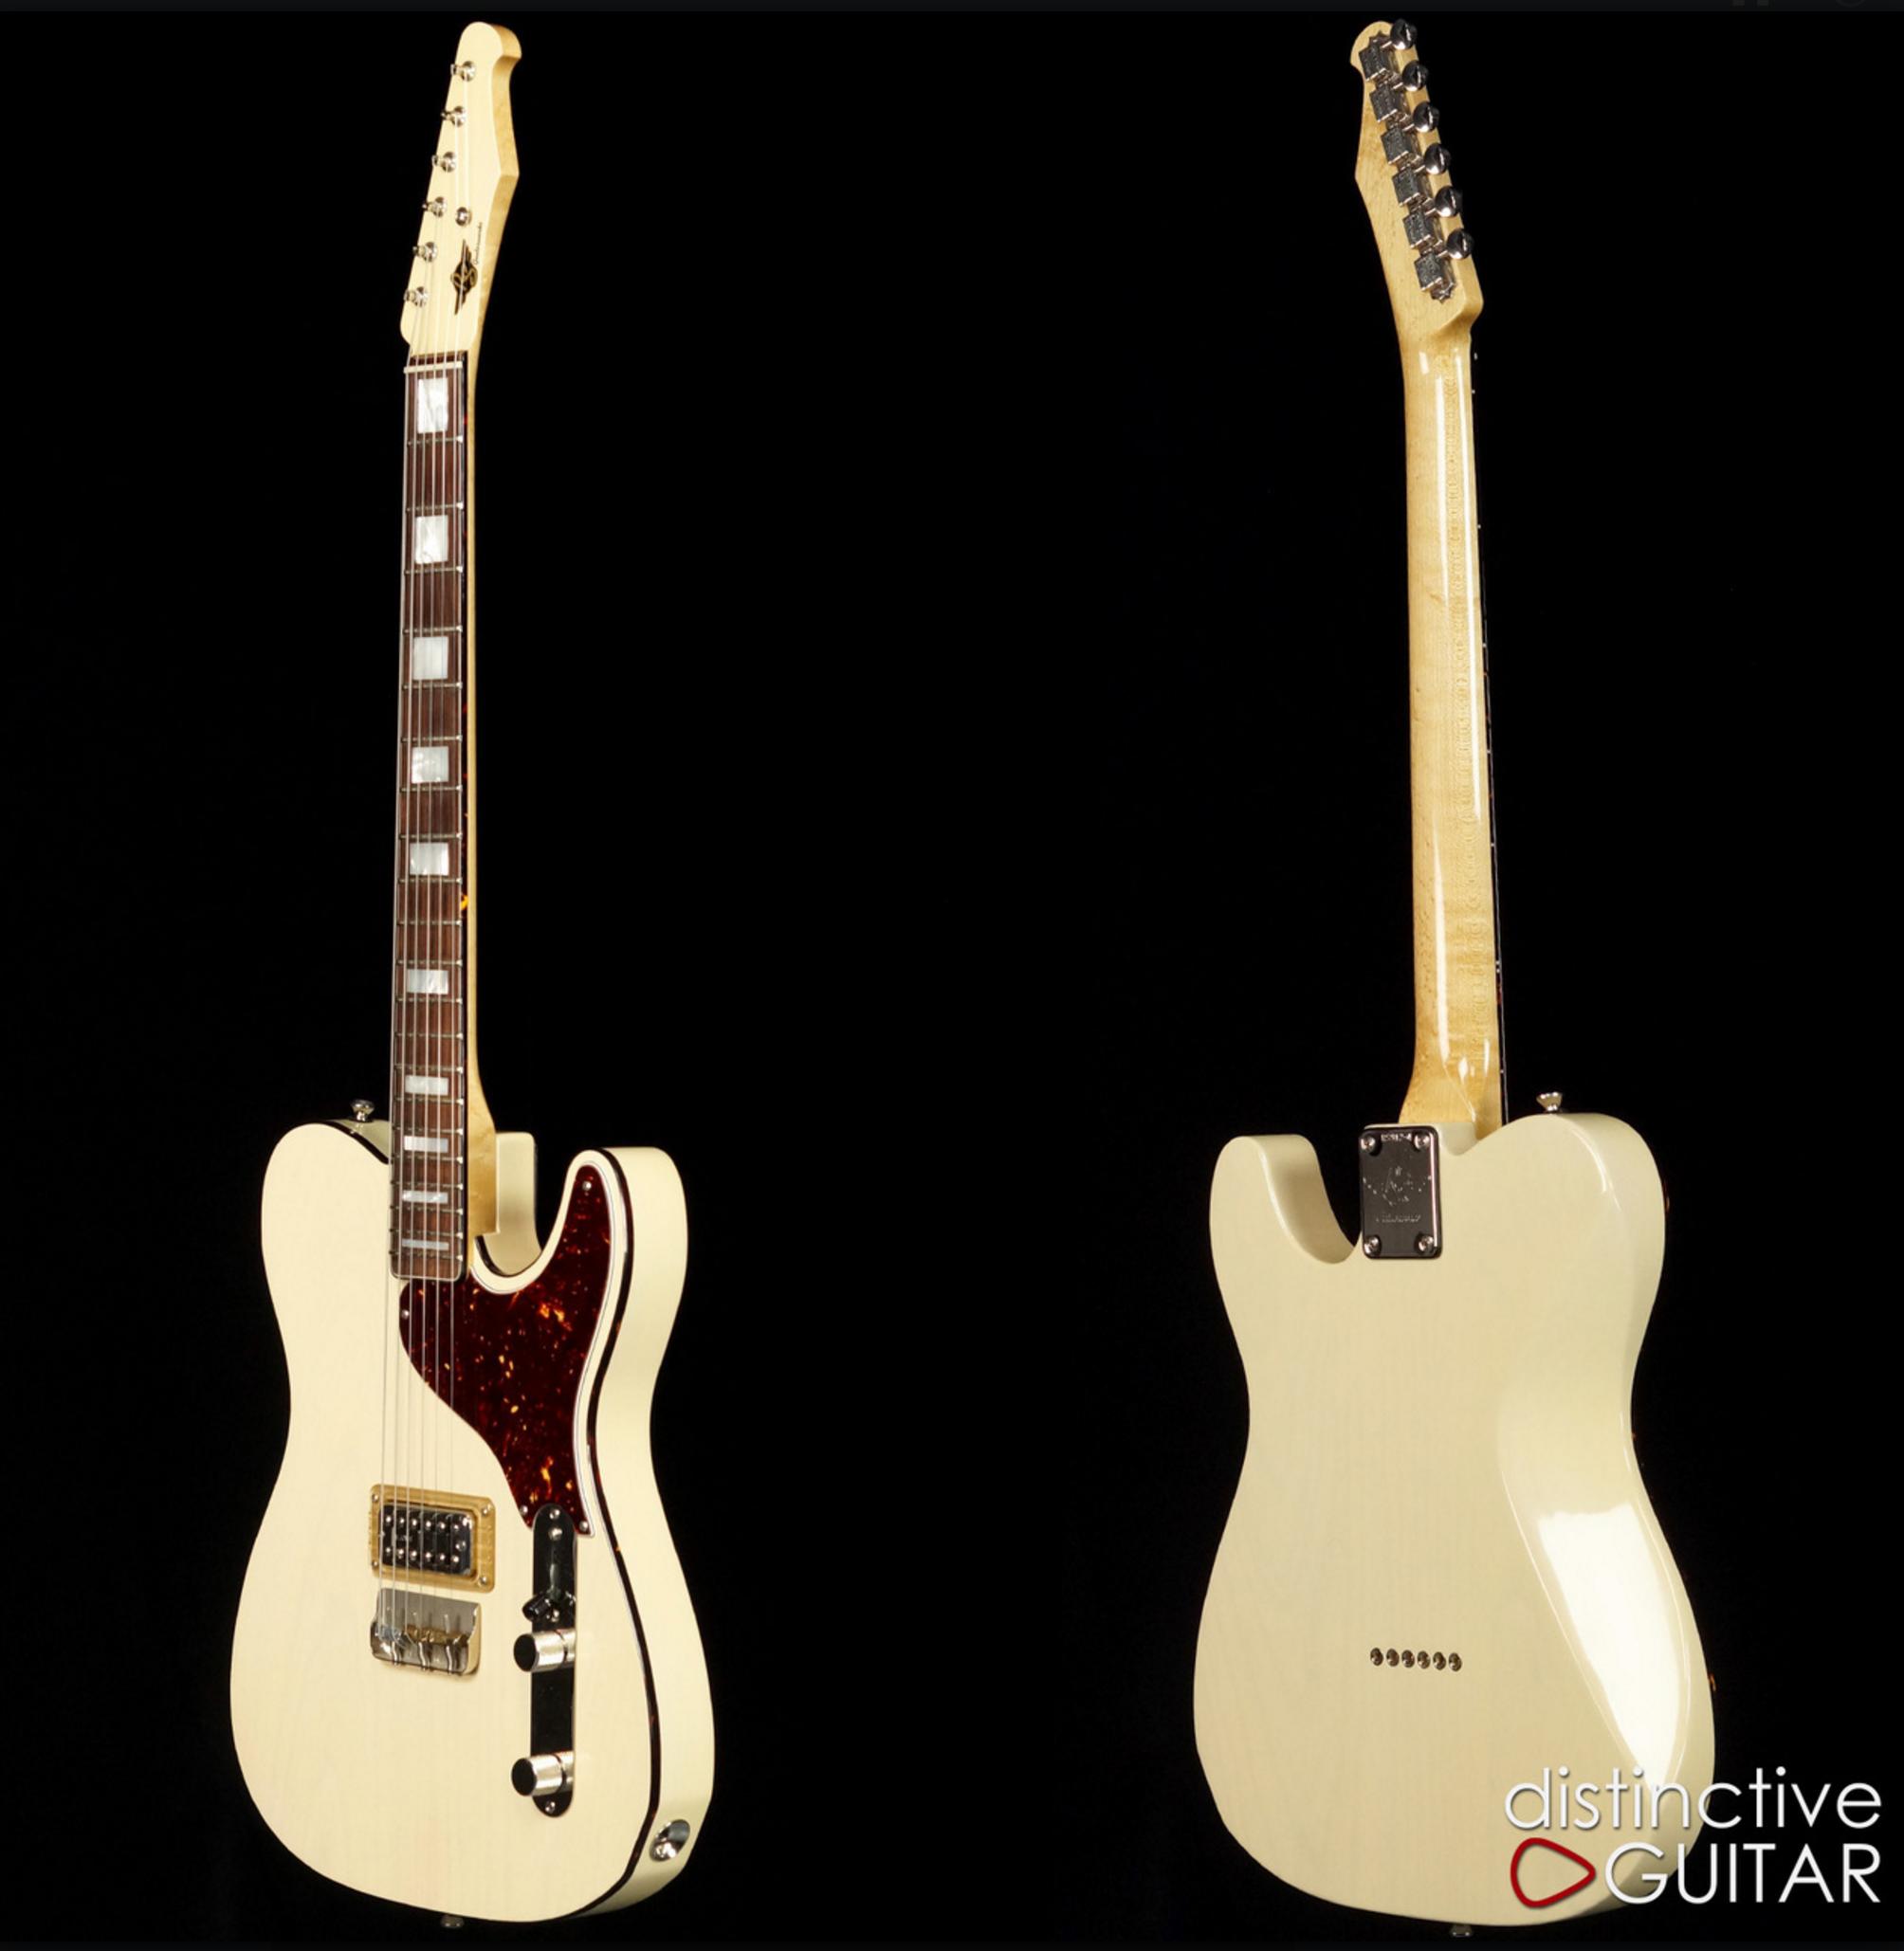 RS Guitar Works | RS Guitar Works | Pinterest | Guitar